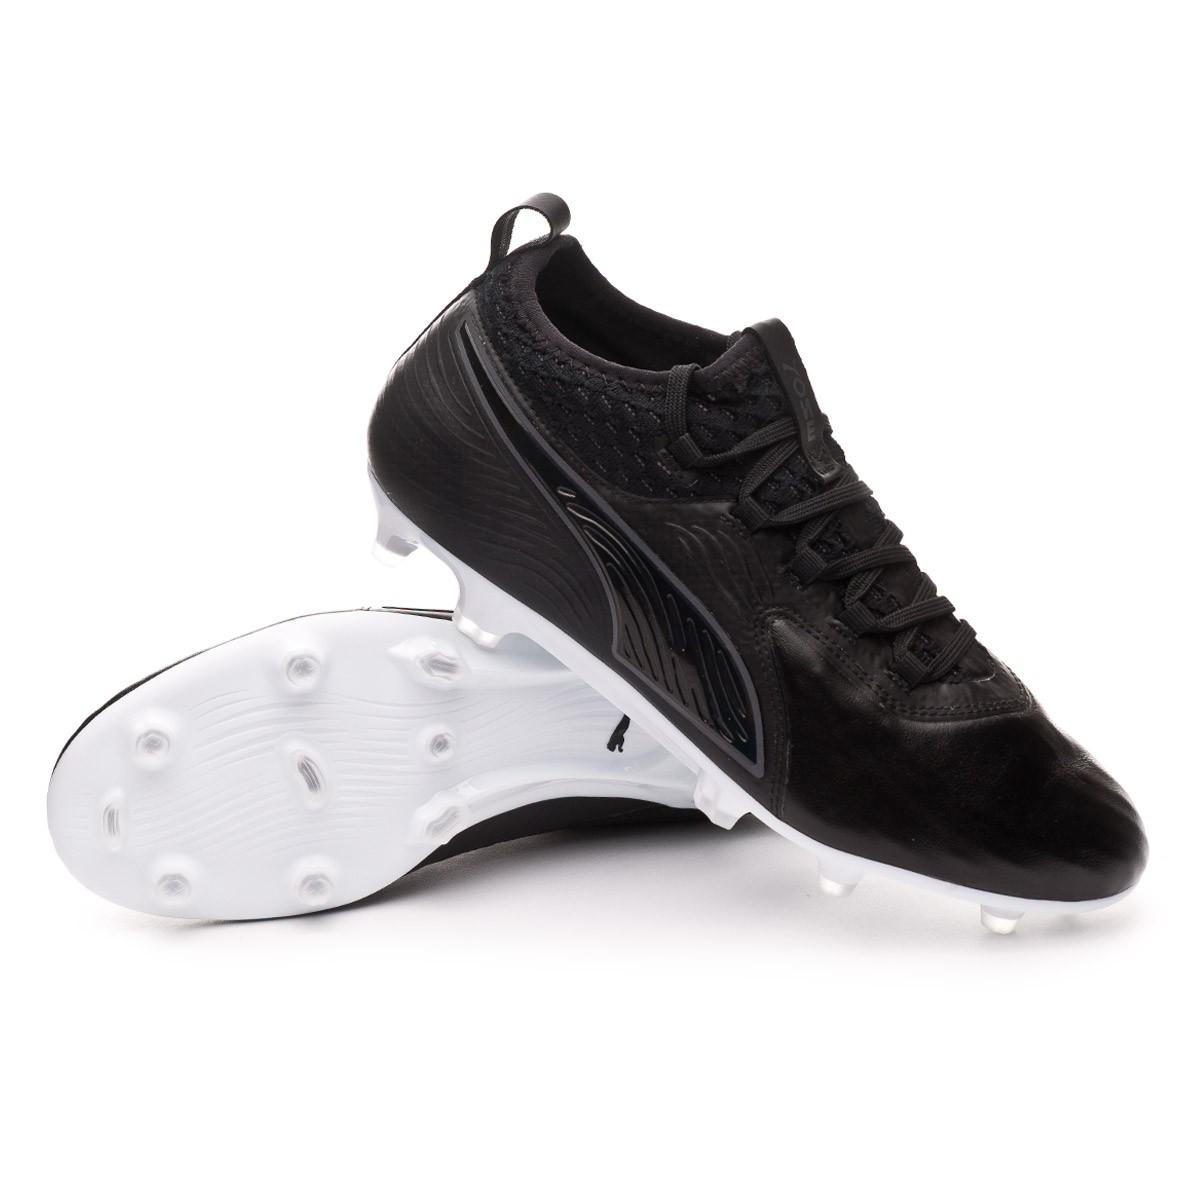 Chuteira Puma One 19.2 FG AG Black-White - Loja de futebol Fútbol Emotion 9daacb3b5727e